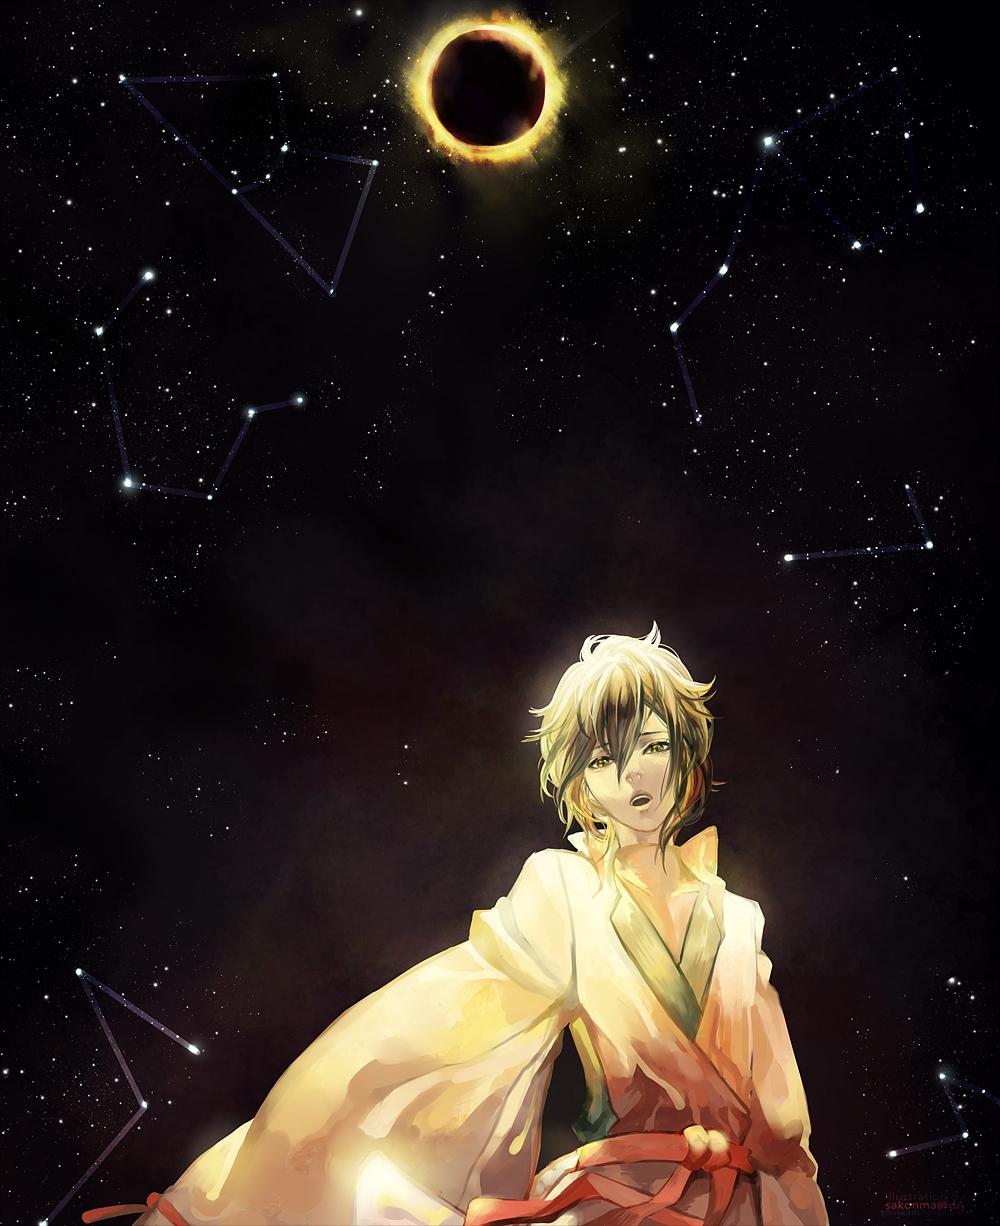 From the new world satoru